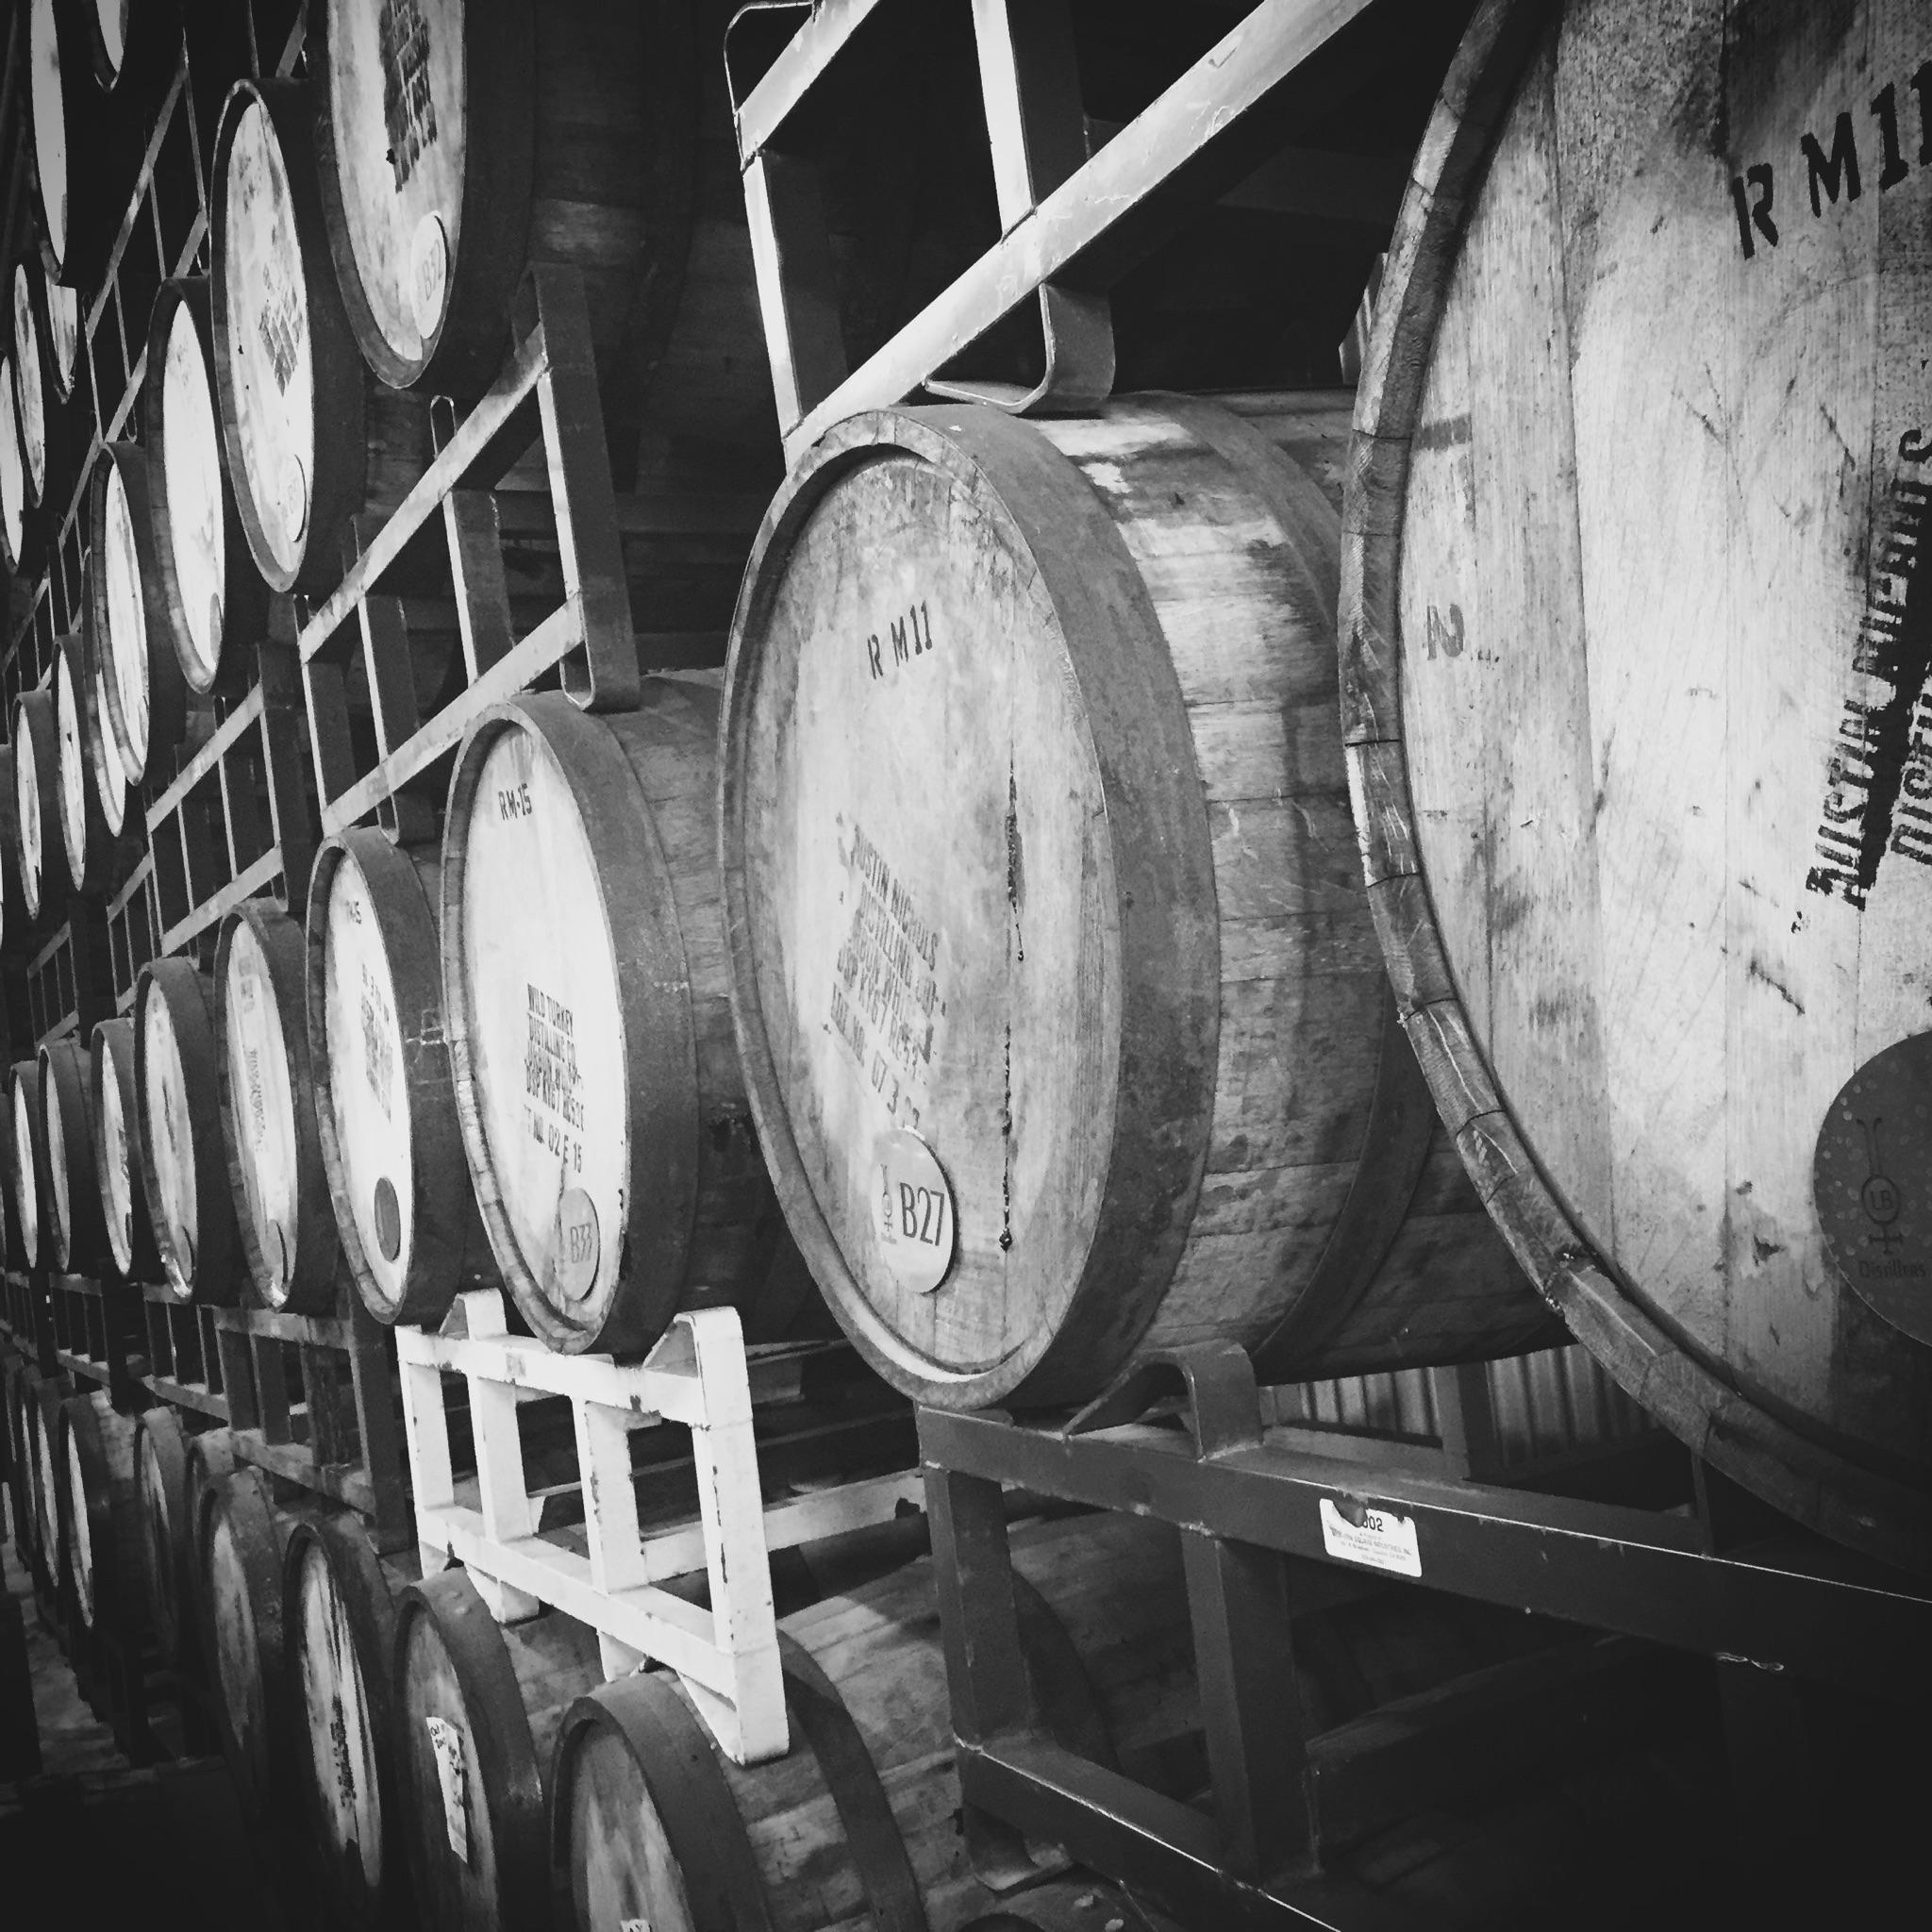 lucky bastard distillers Canadian whisky